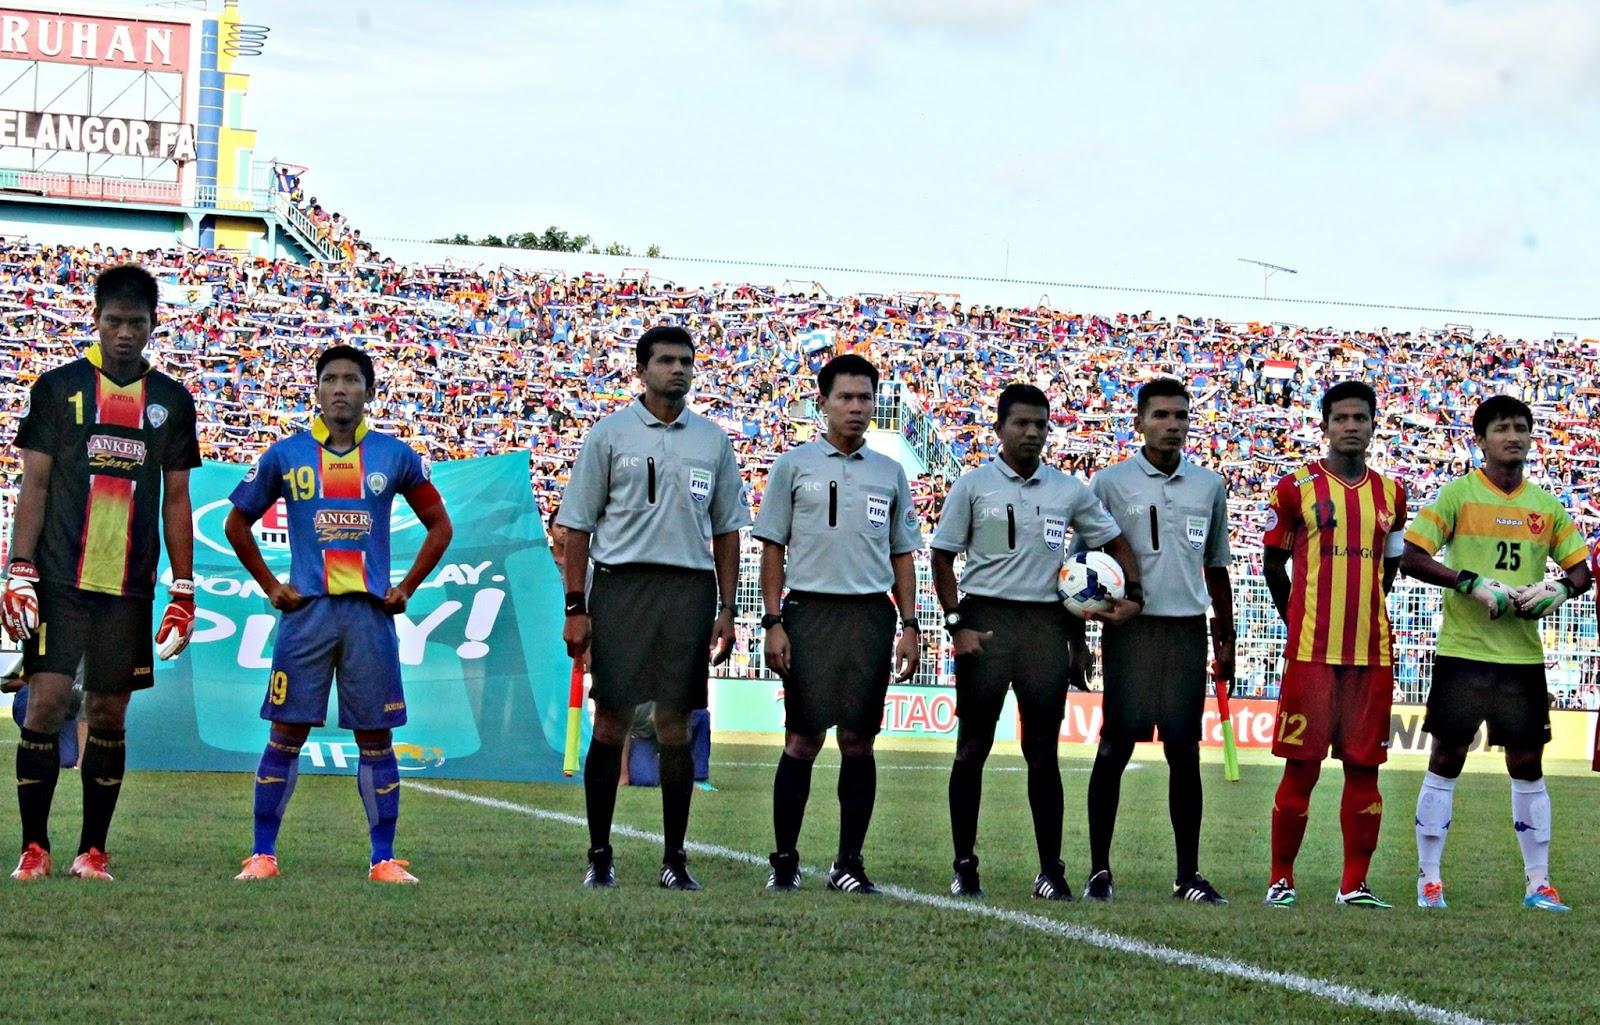 Arema Vs Indonesia: FIFA Referees News: 2014 AFC Cup